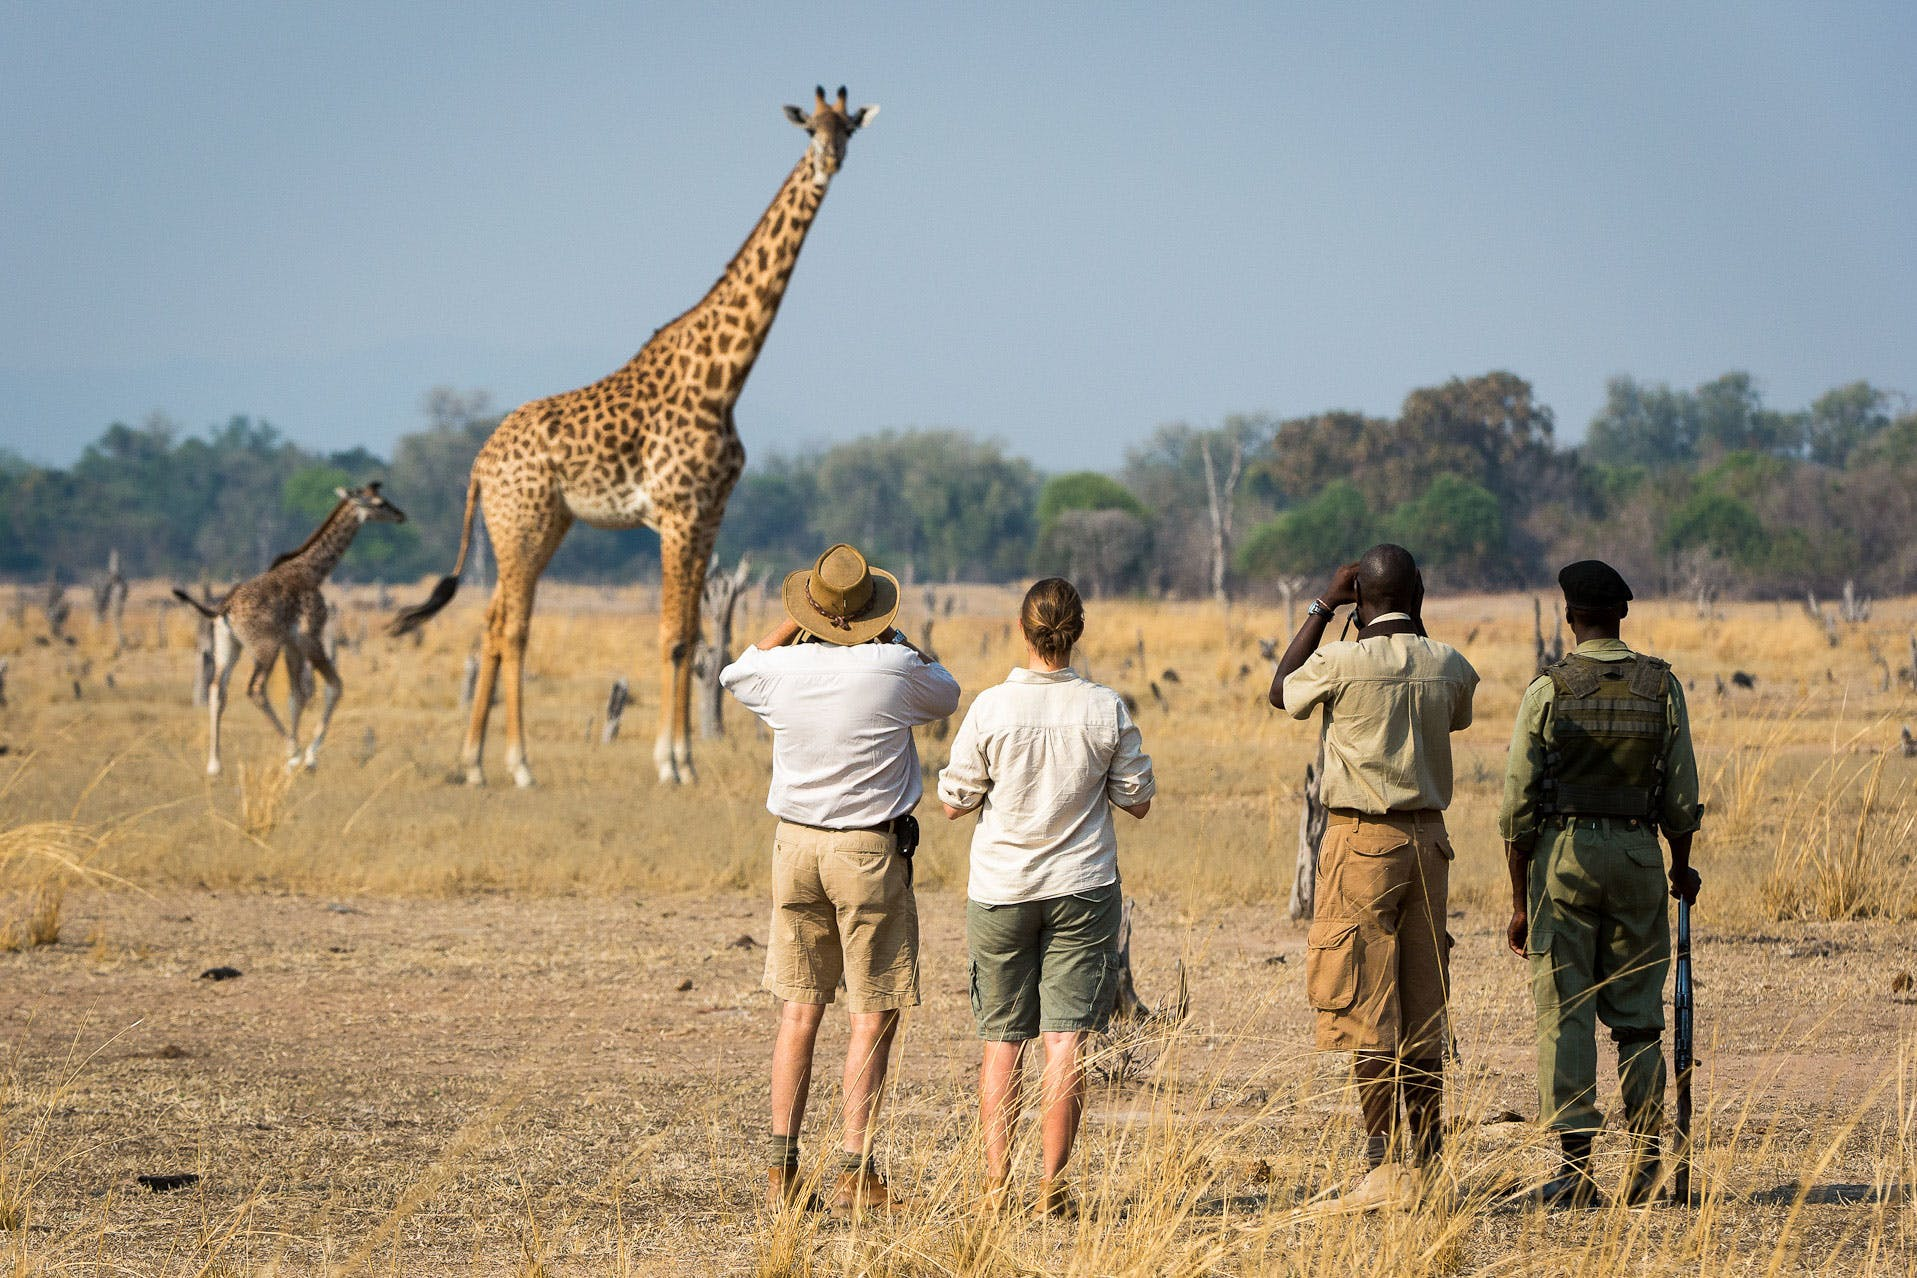 Walking Safari South Luangwa National Park - What to do in Zambia